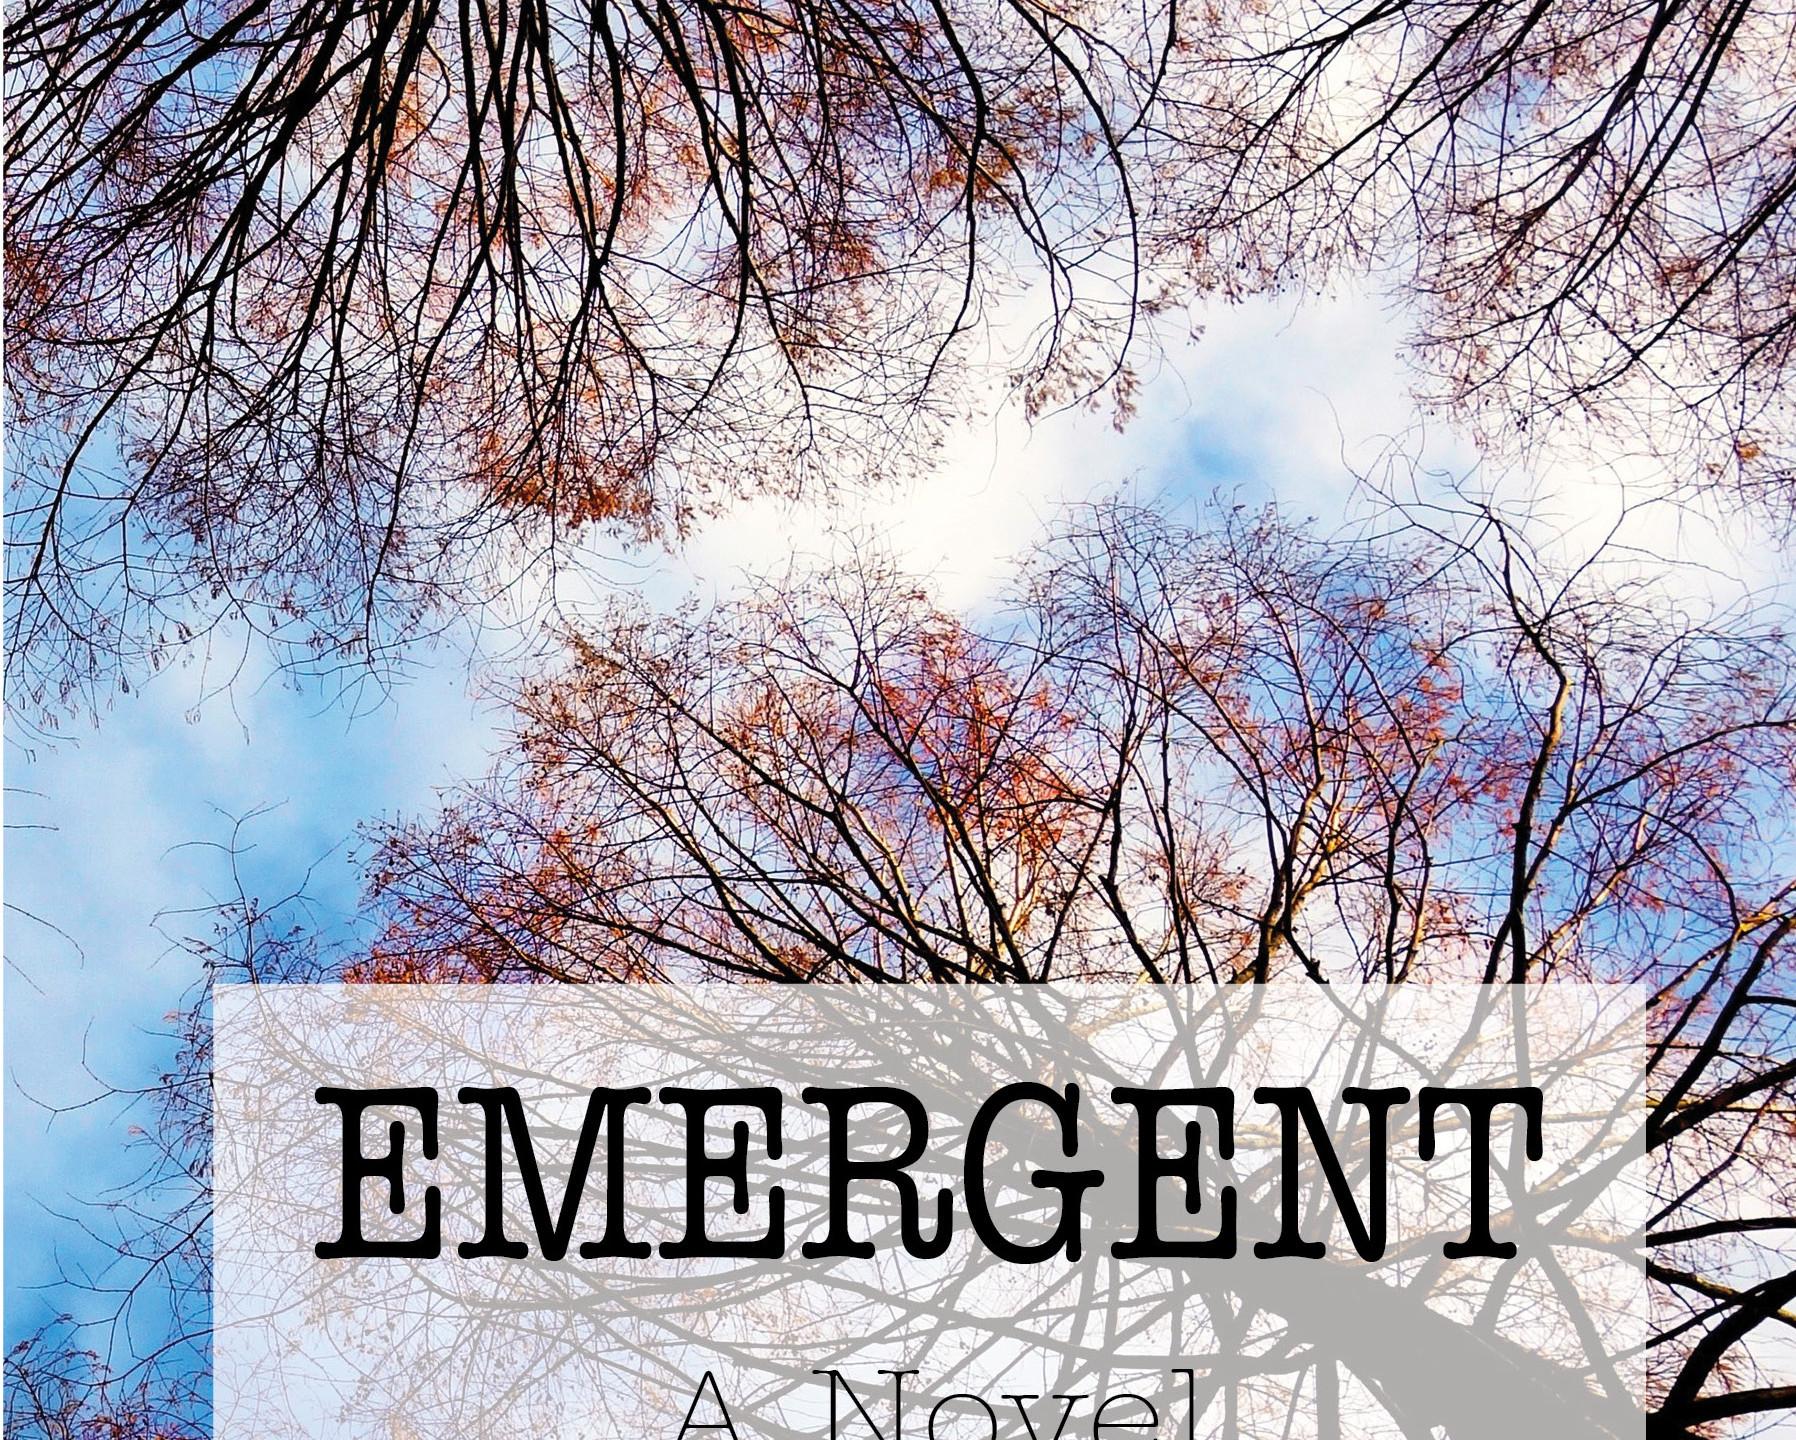 Emergent - 6